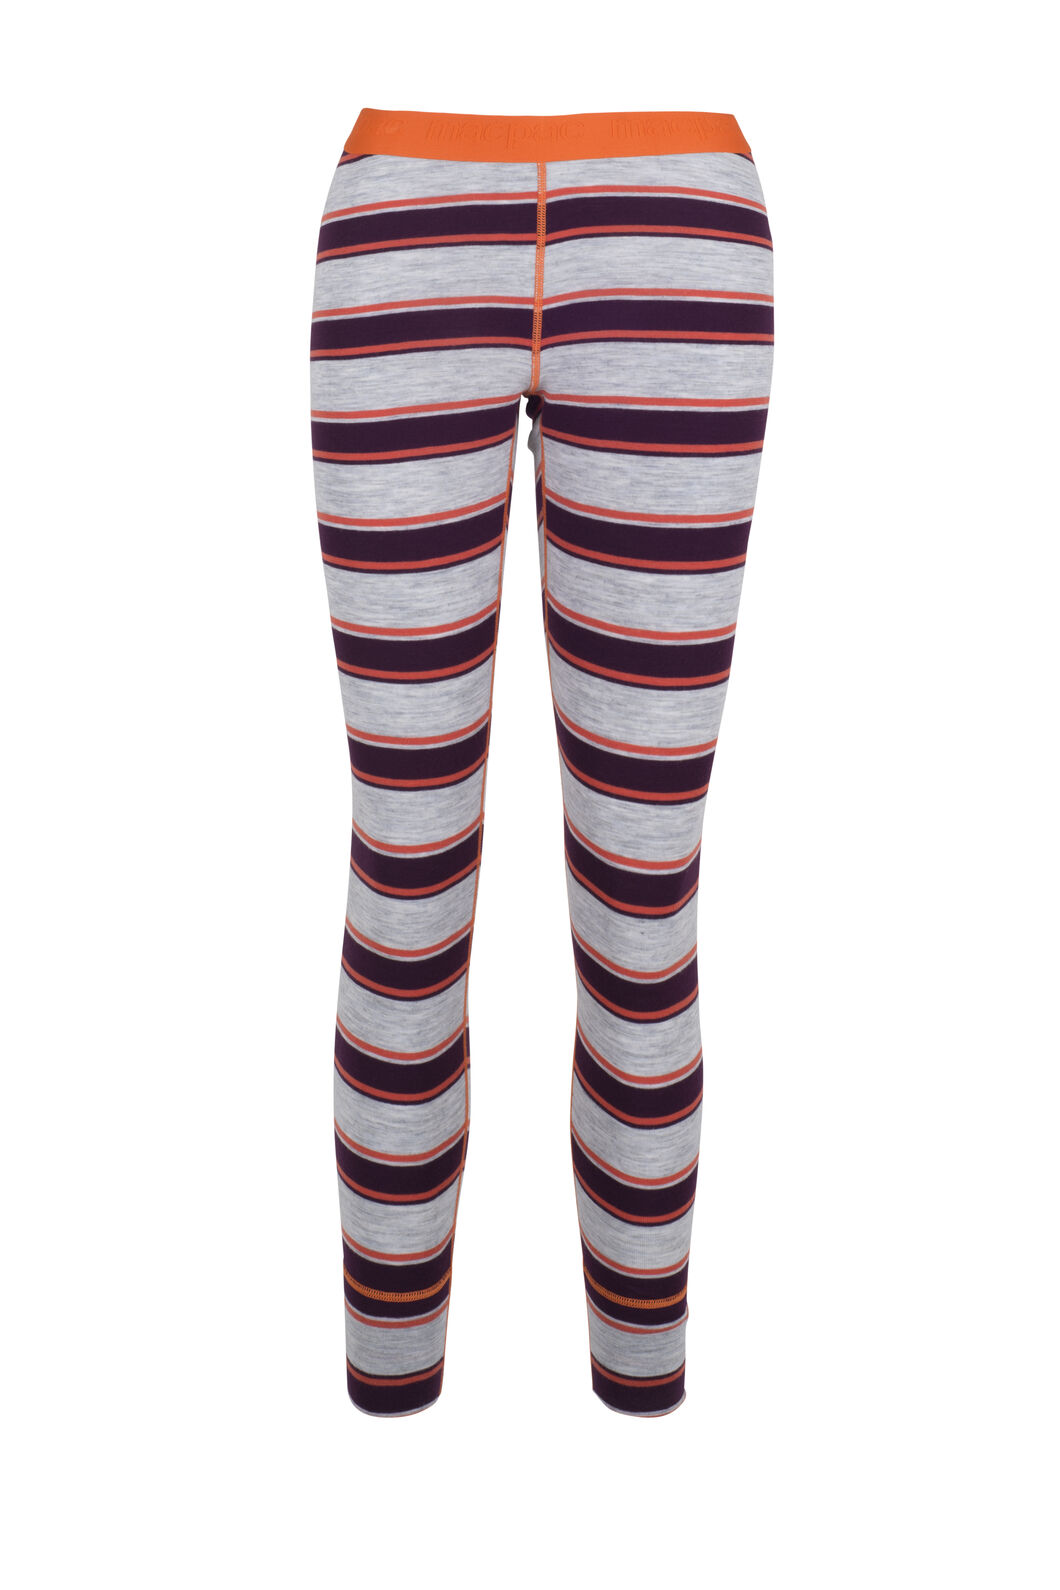 Macpac 220 Merino Long Johns - Women's, Purple Stripe, hi-res